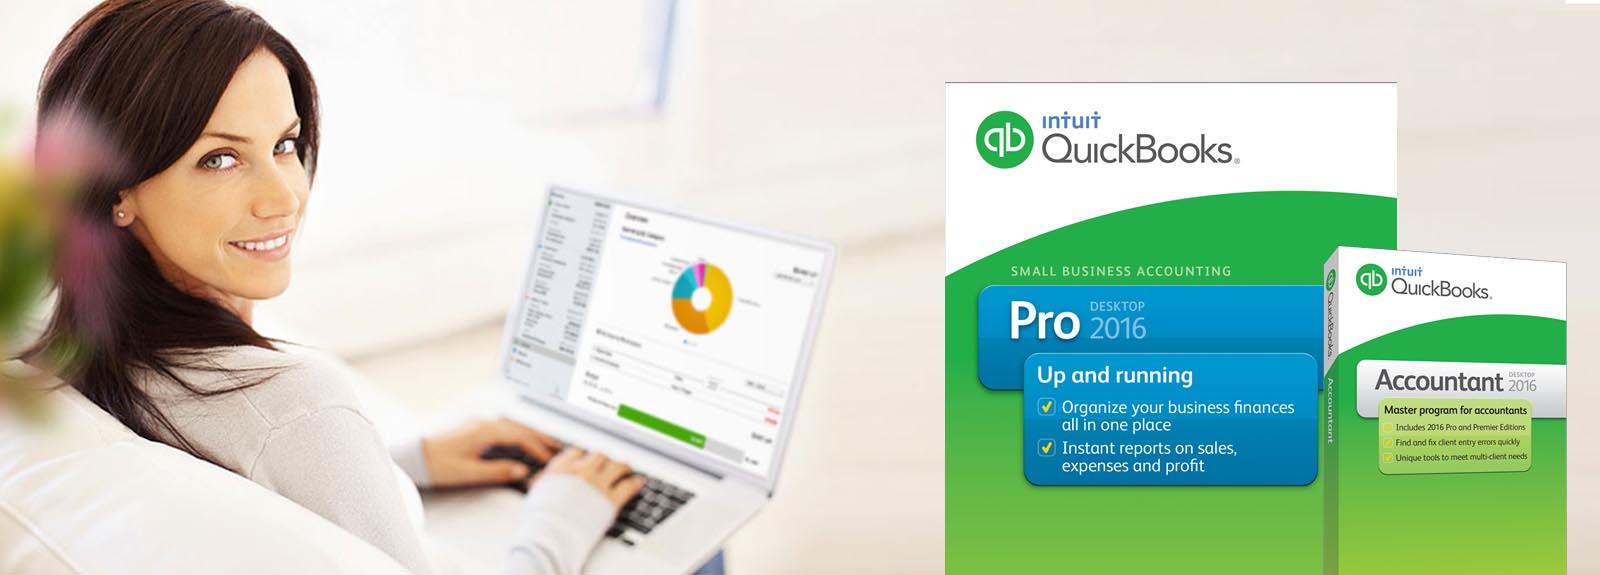 Association of QuickBooks Error Support Helps, Latest News Adda